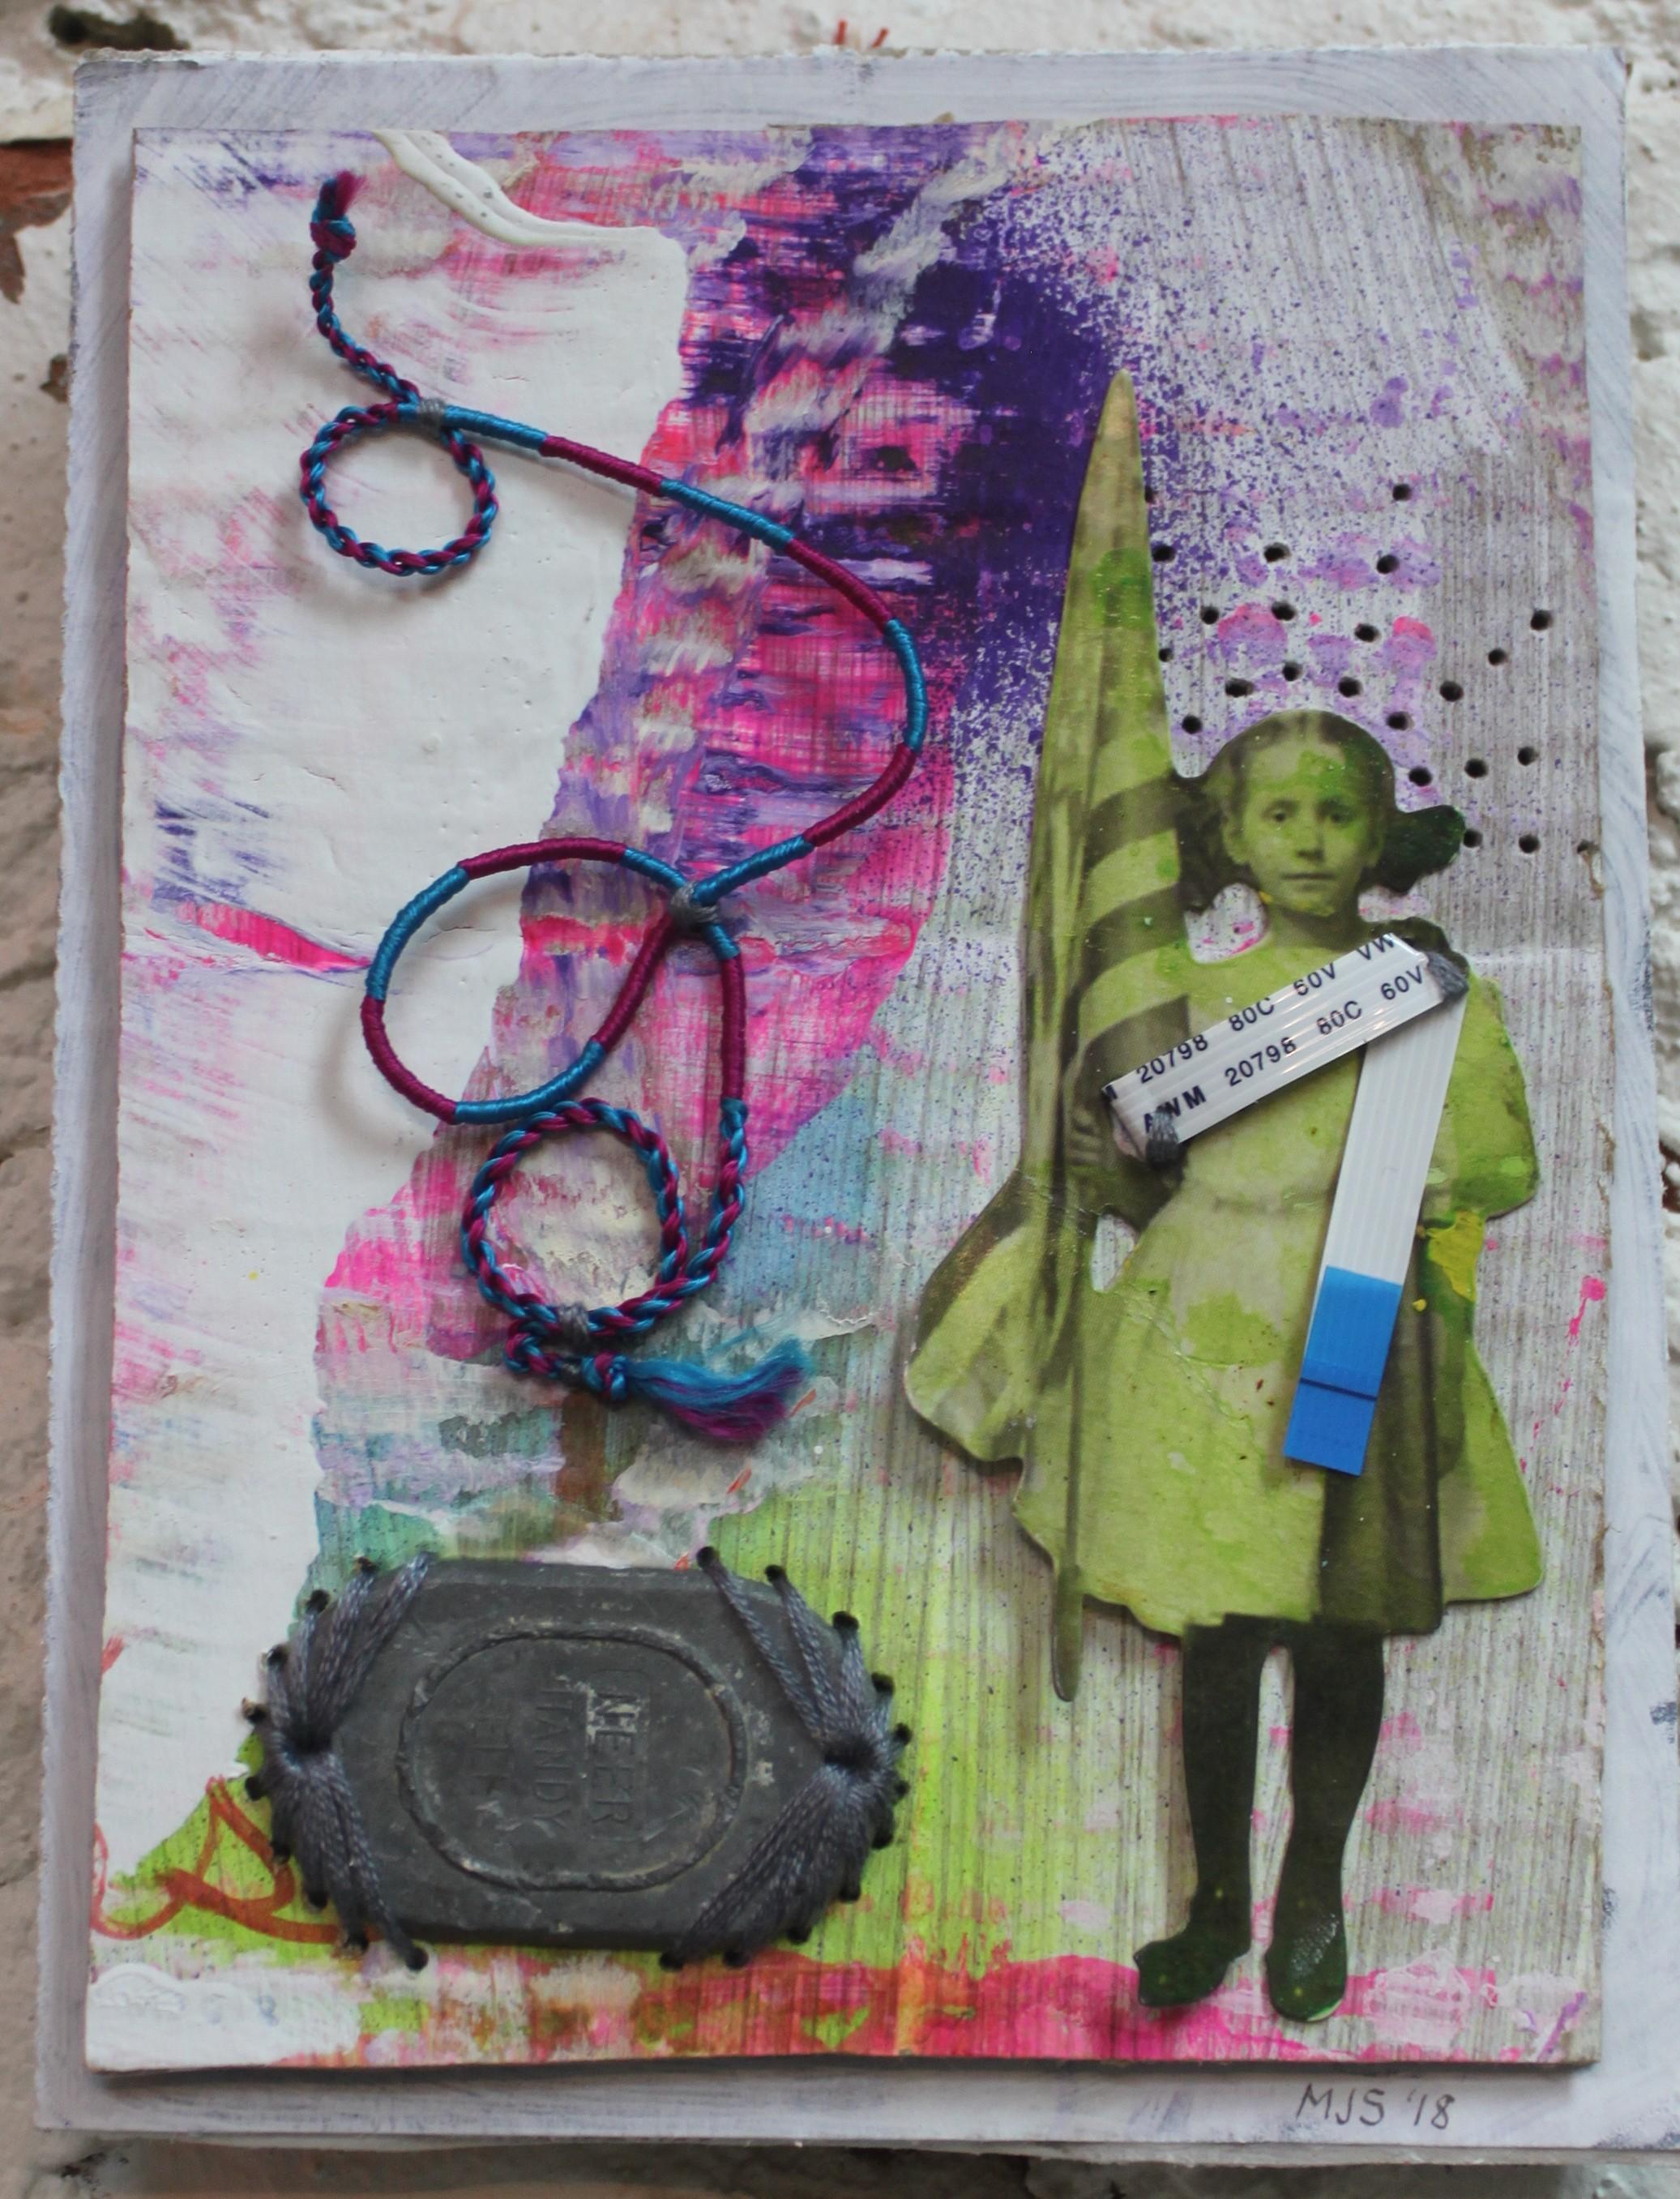 MiriamJuliannaSutton-Untitled-mixedmedia-9x11x2018x$125.JPG